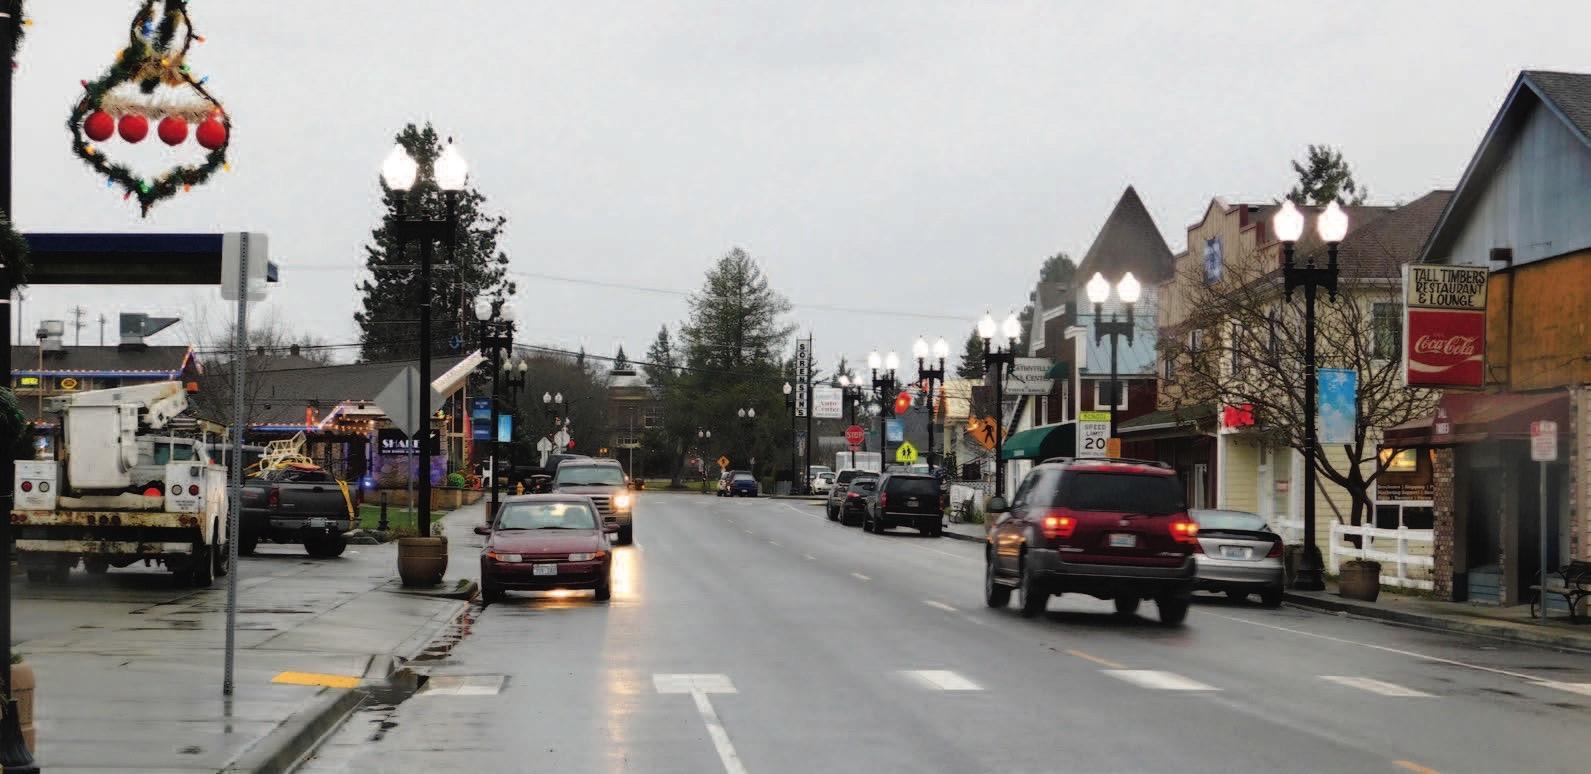 Downtown Eatonville, street view